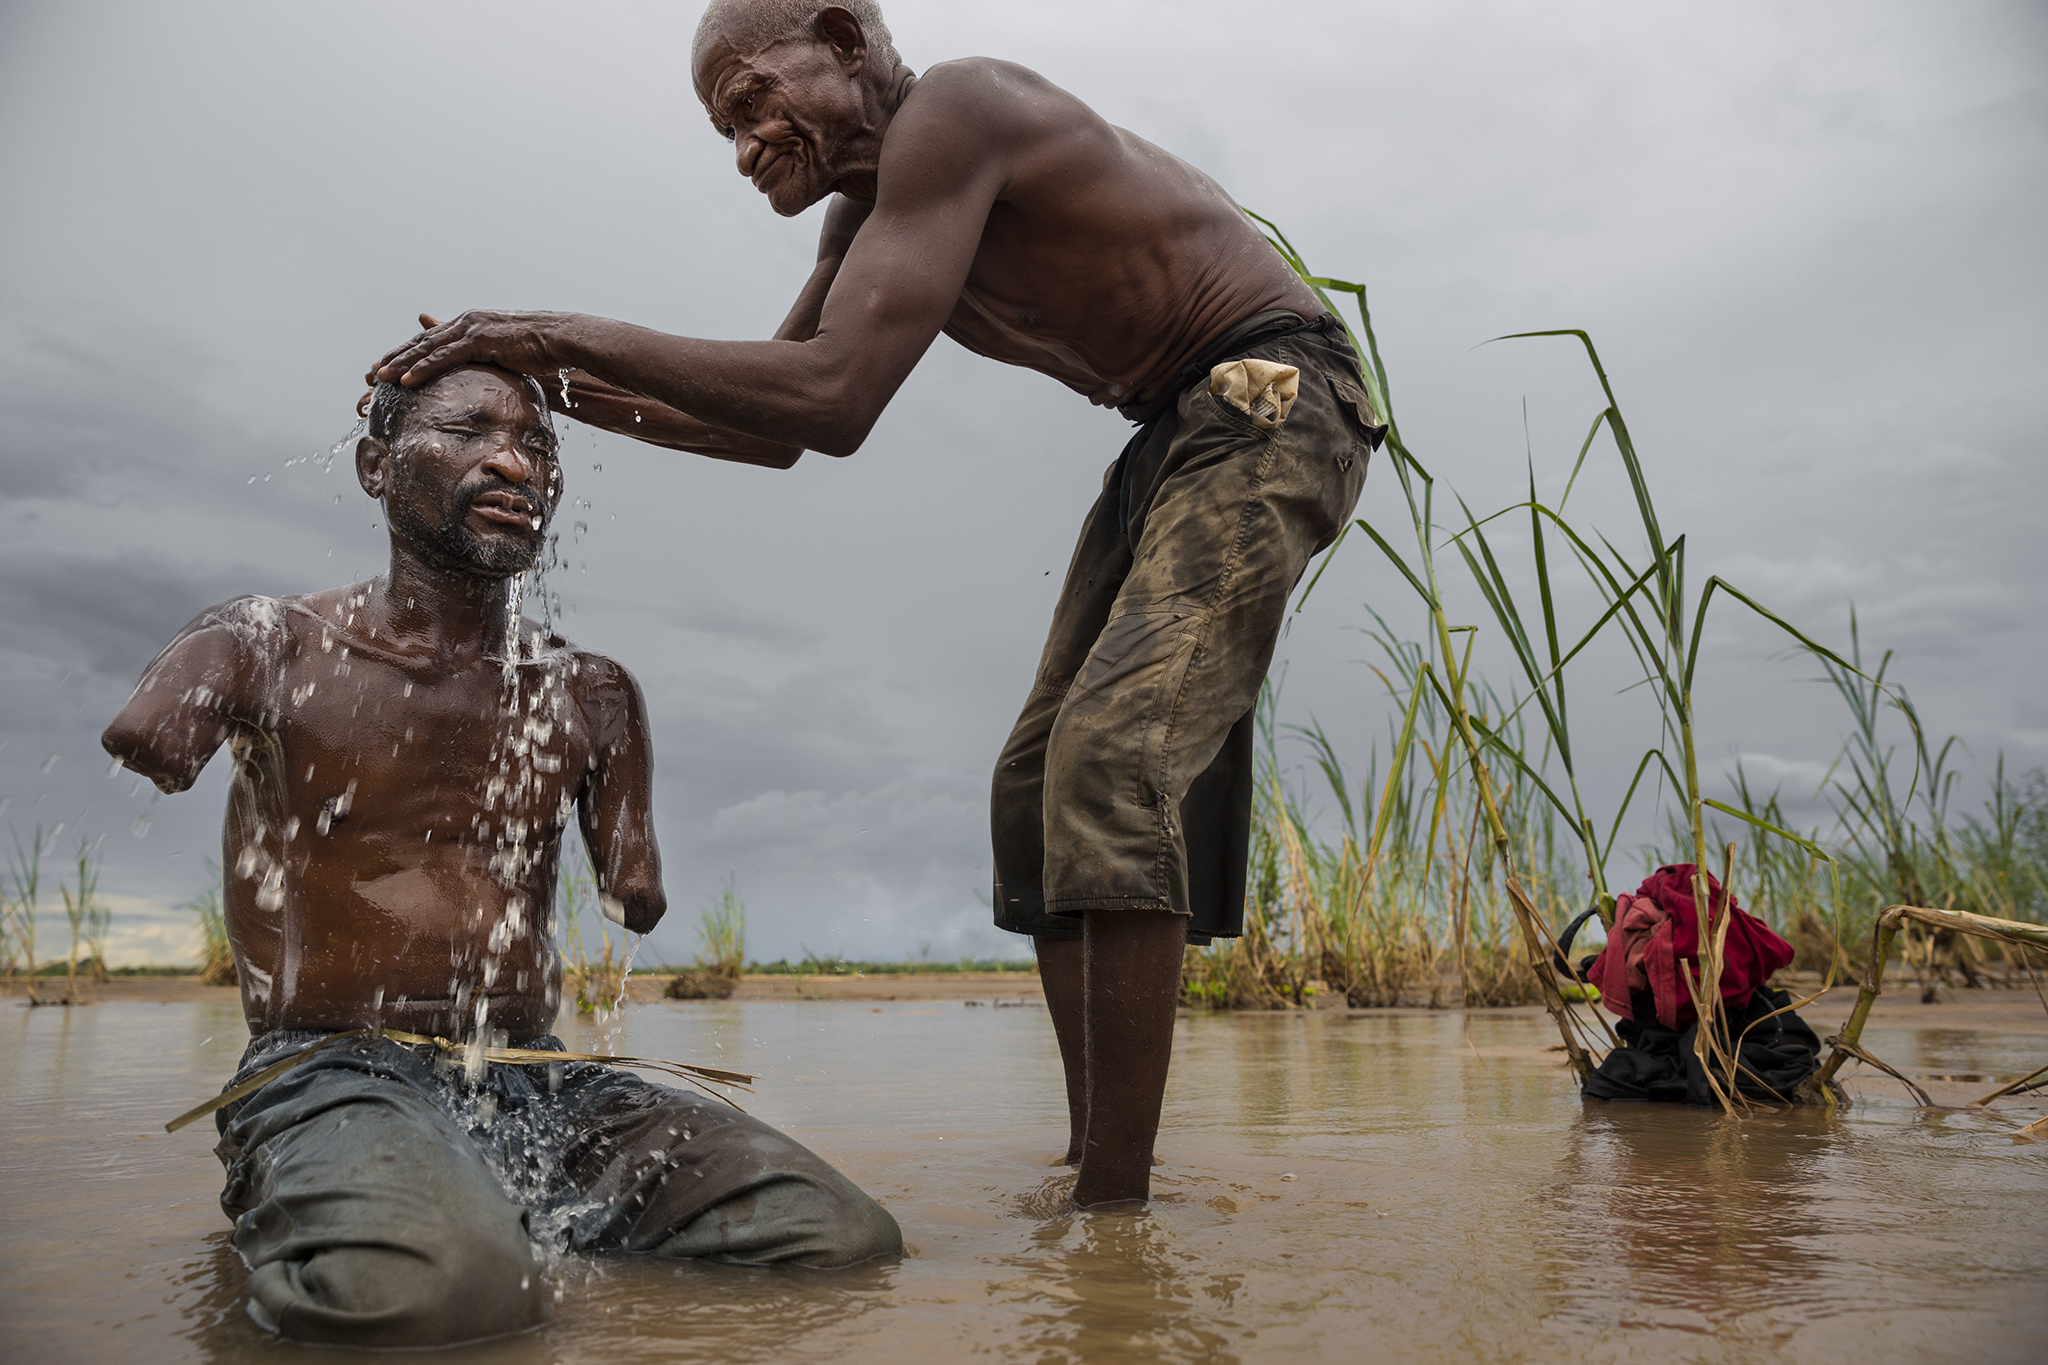 Men washing, Tanzania, 2013